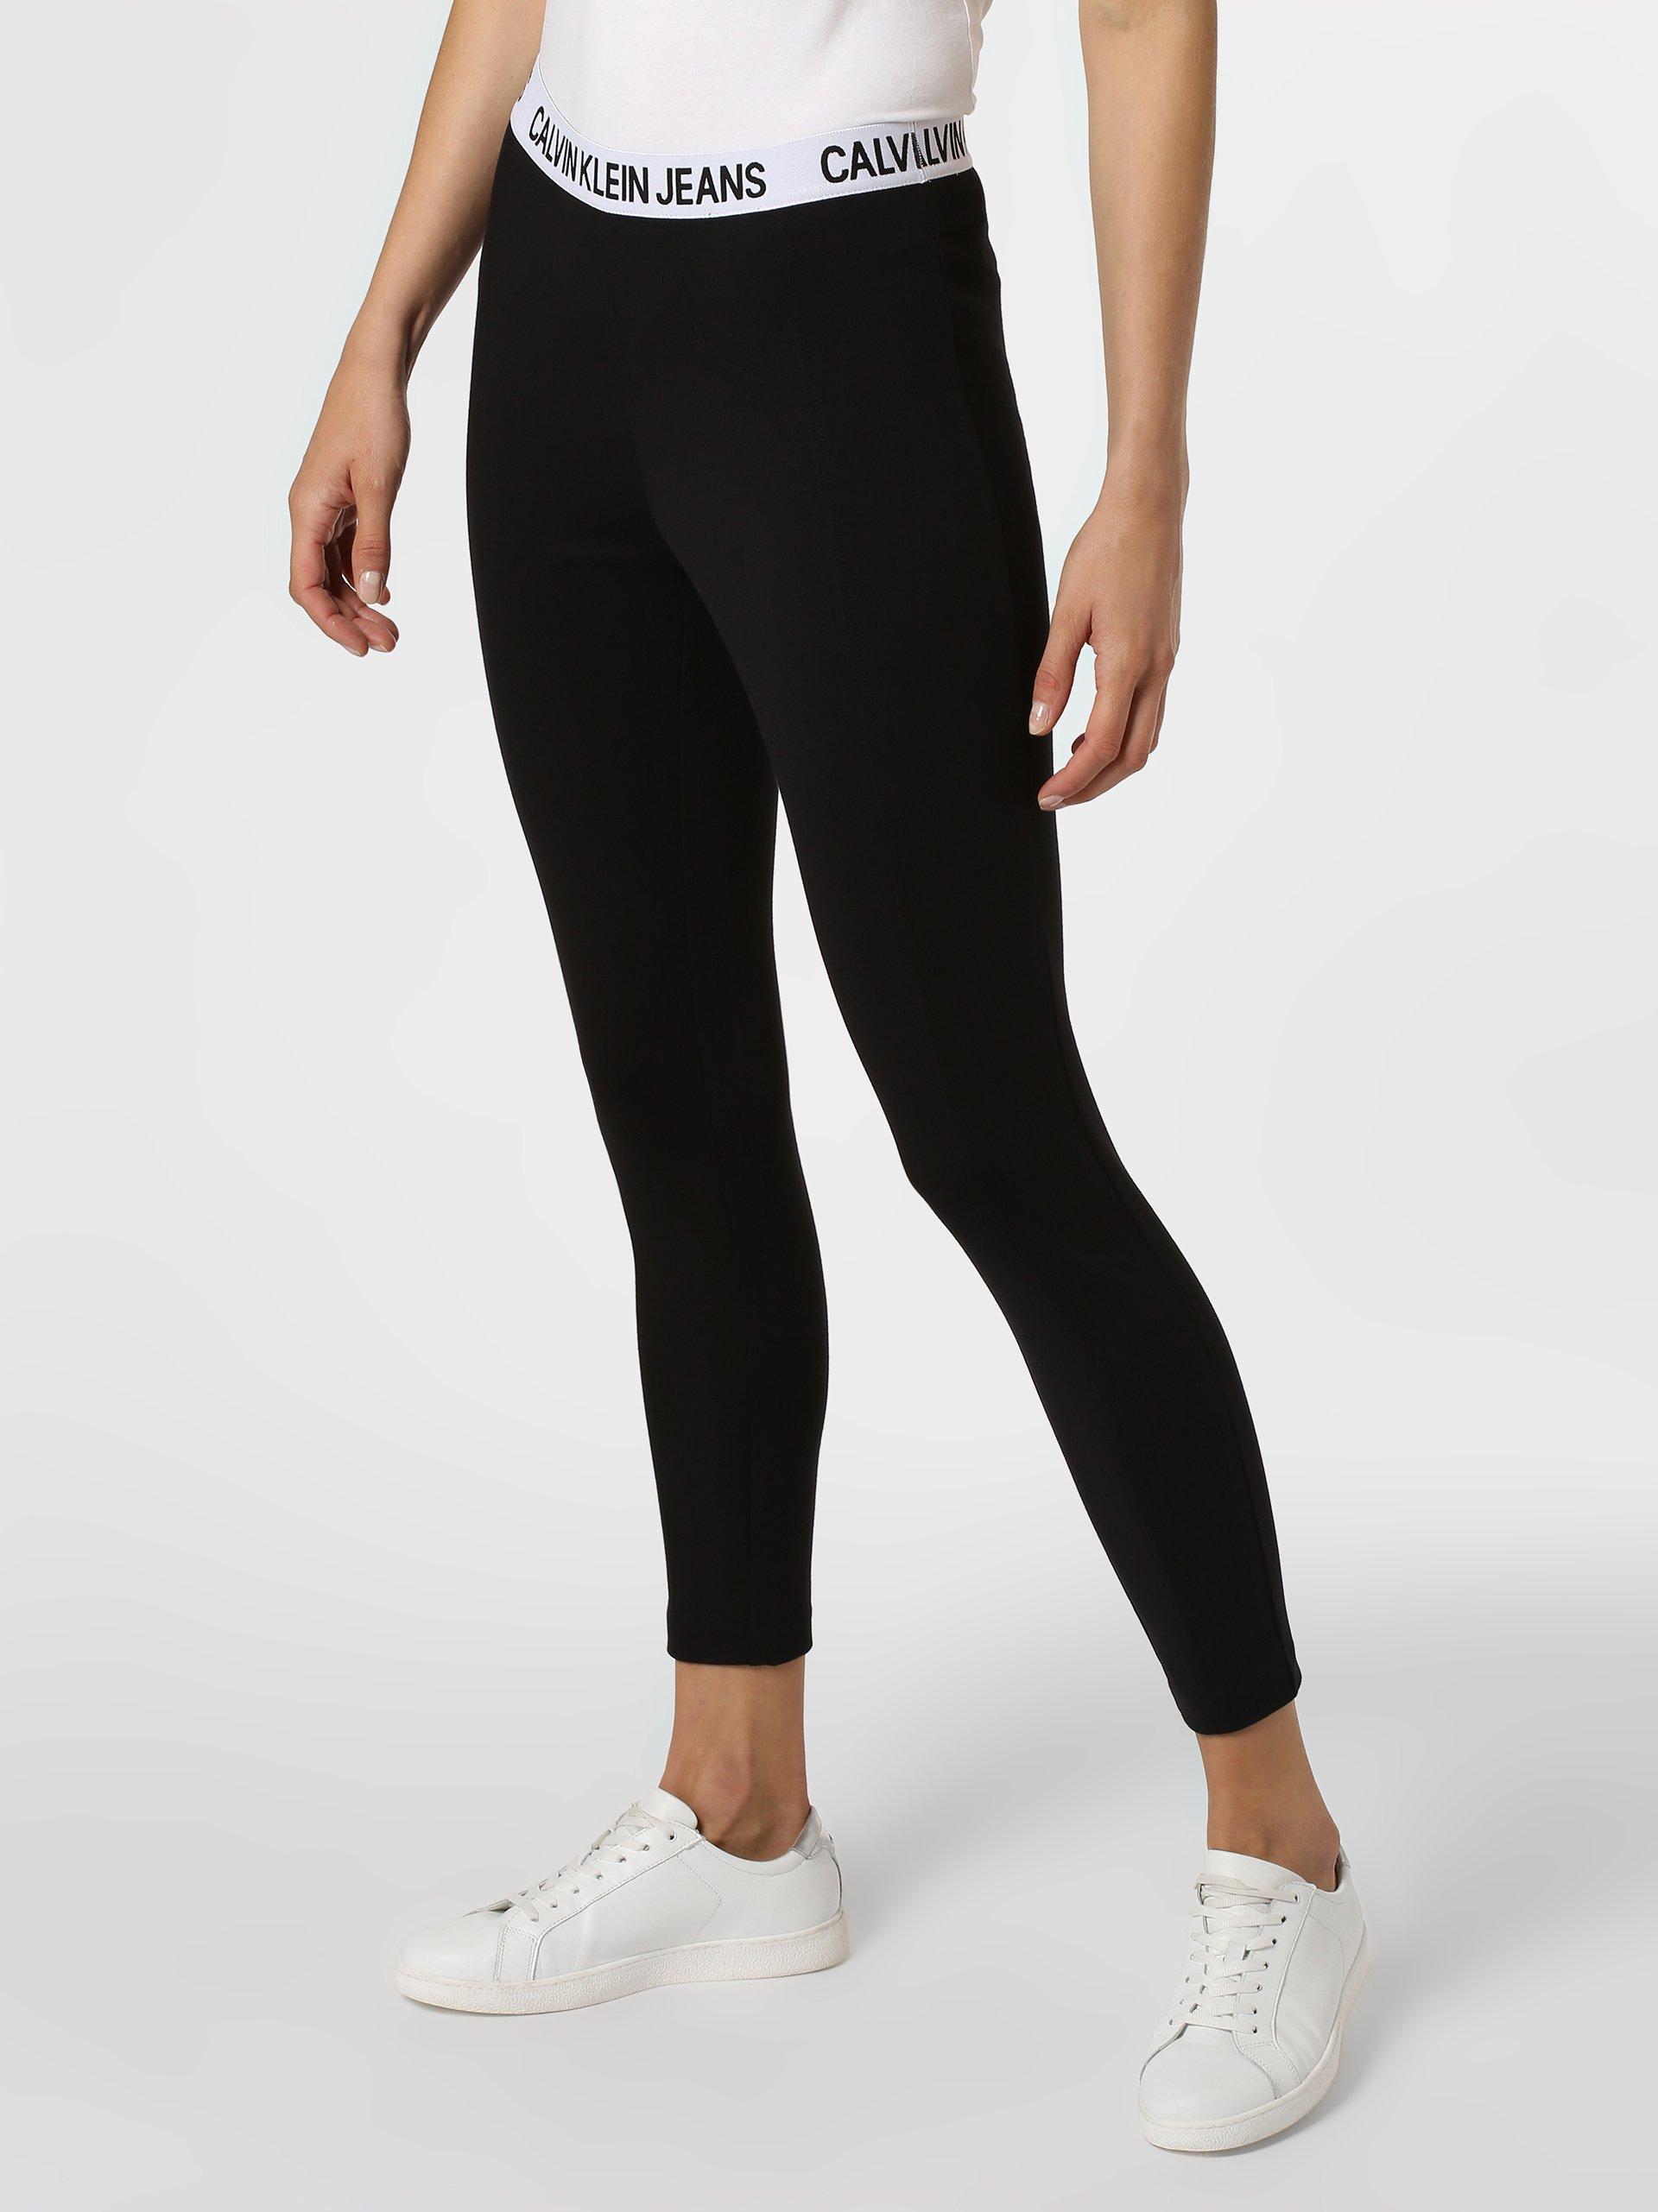 Calvin Klein Jeans Legginsy damskie